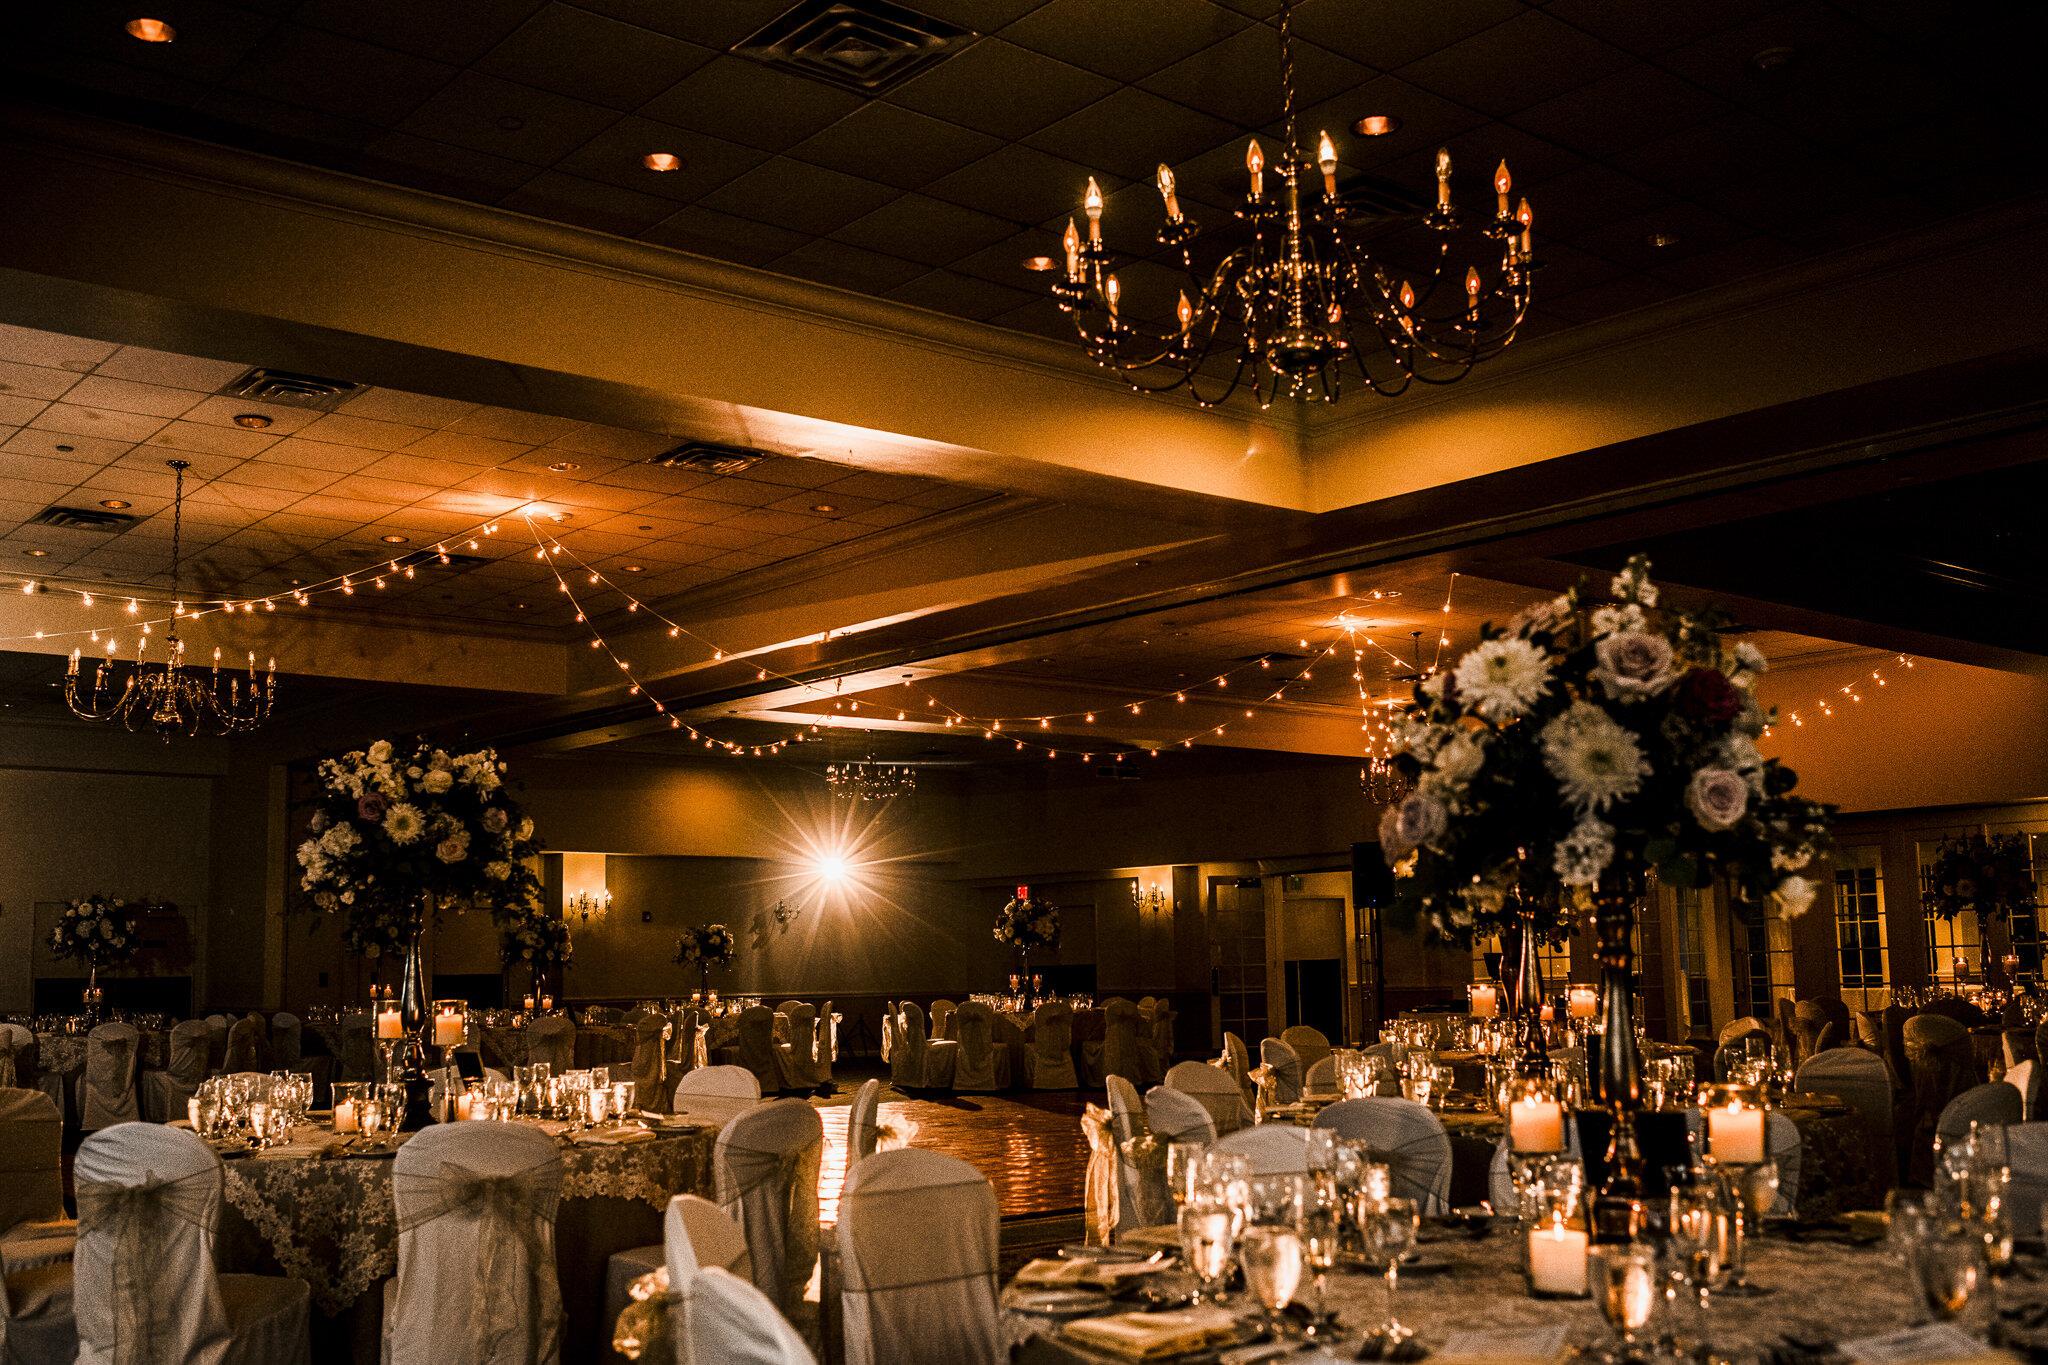 Coyle-Forsgate-Country-Club-Wedding-Photographer-39.JPG